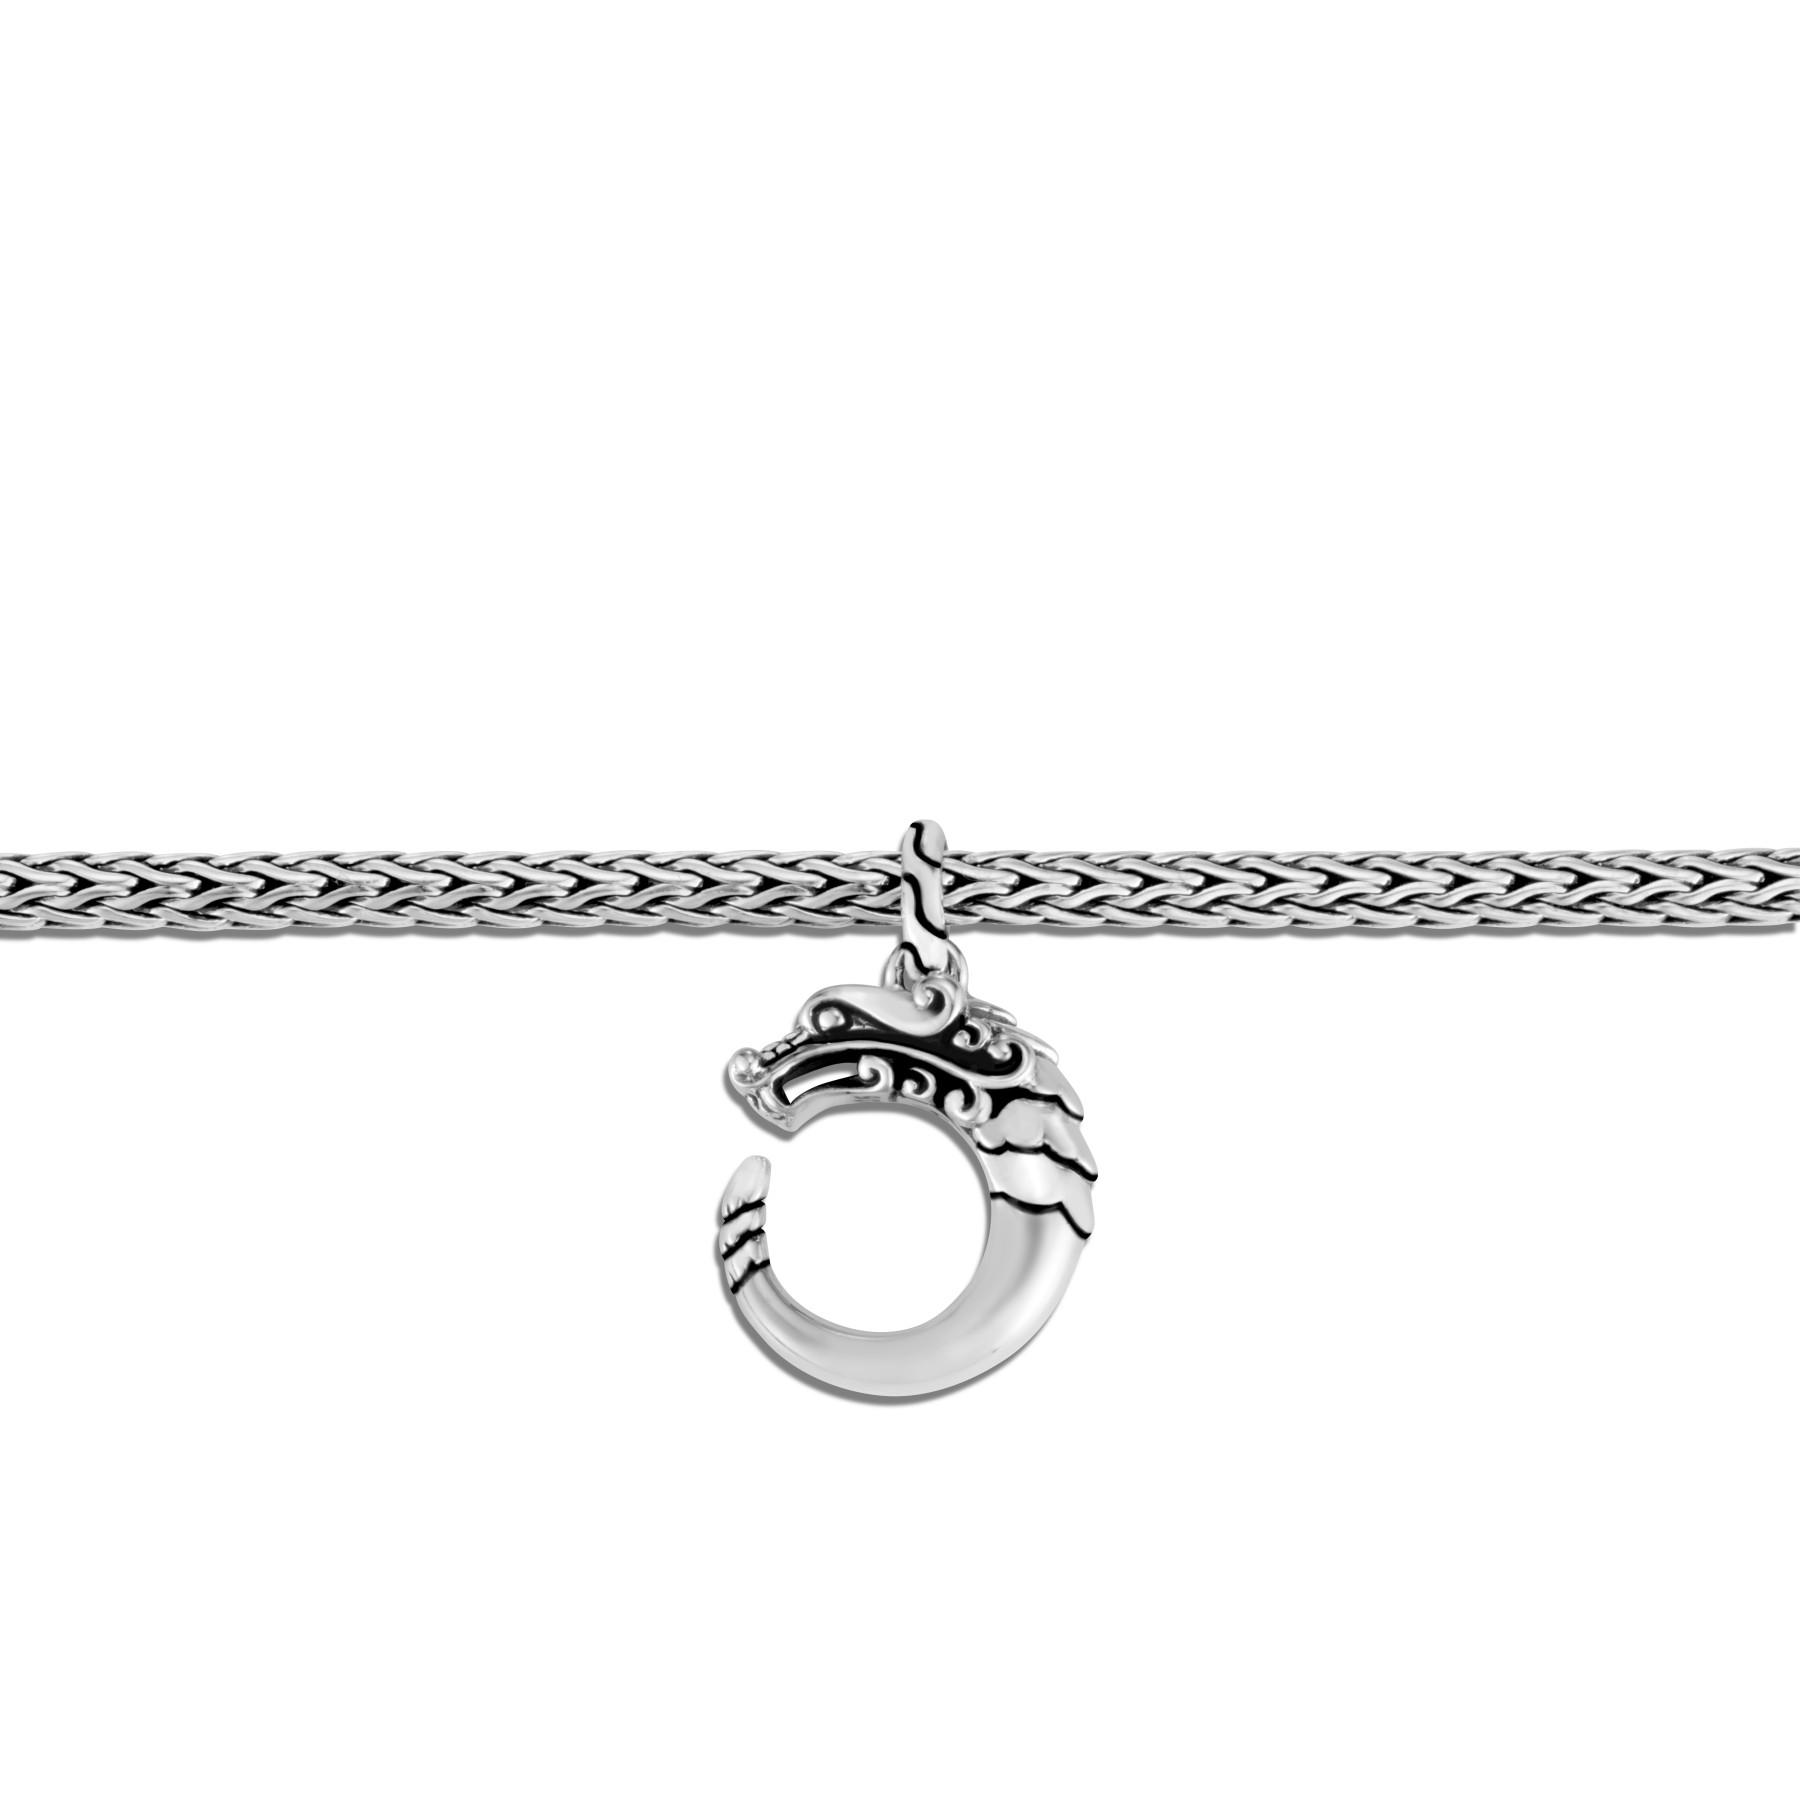 John Hardy Legends Naga Sterling Silver Dragon Charm Bracelet close up